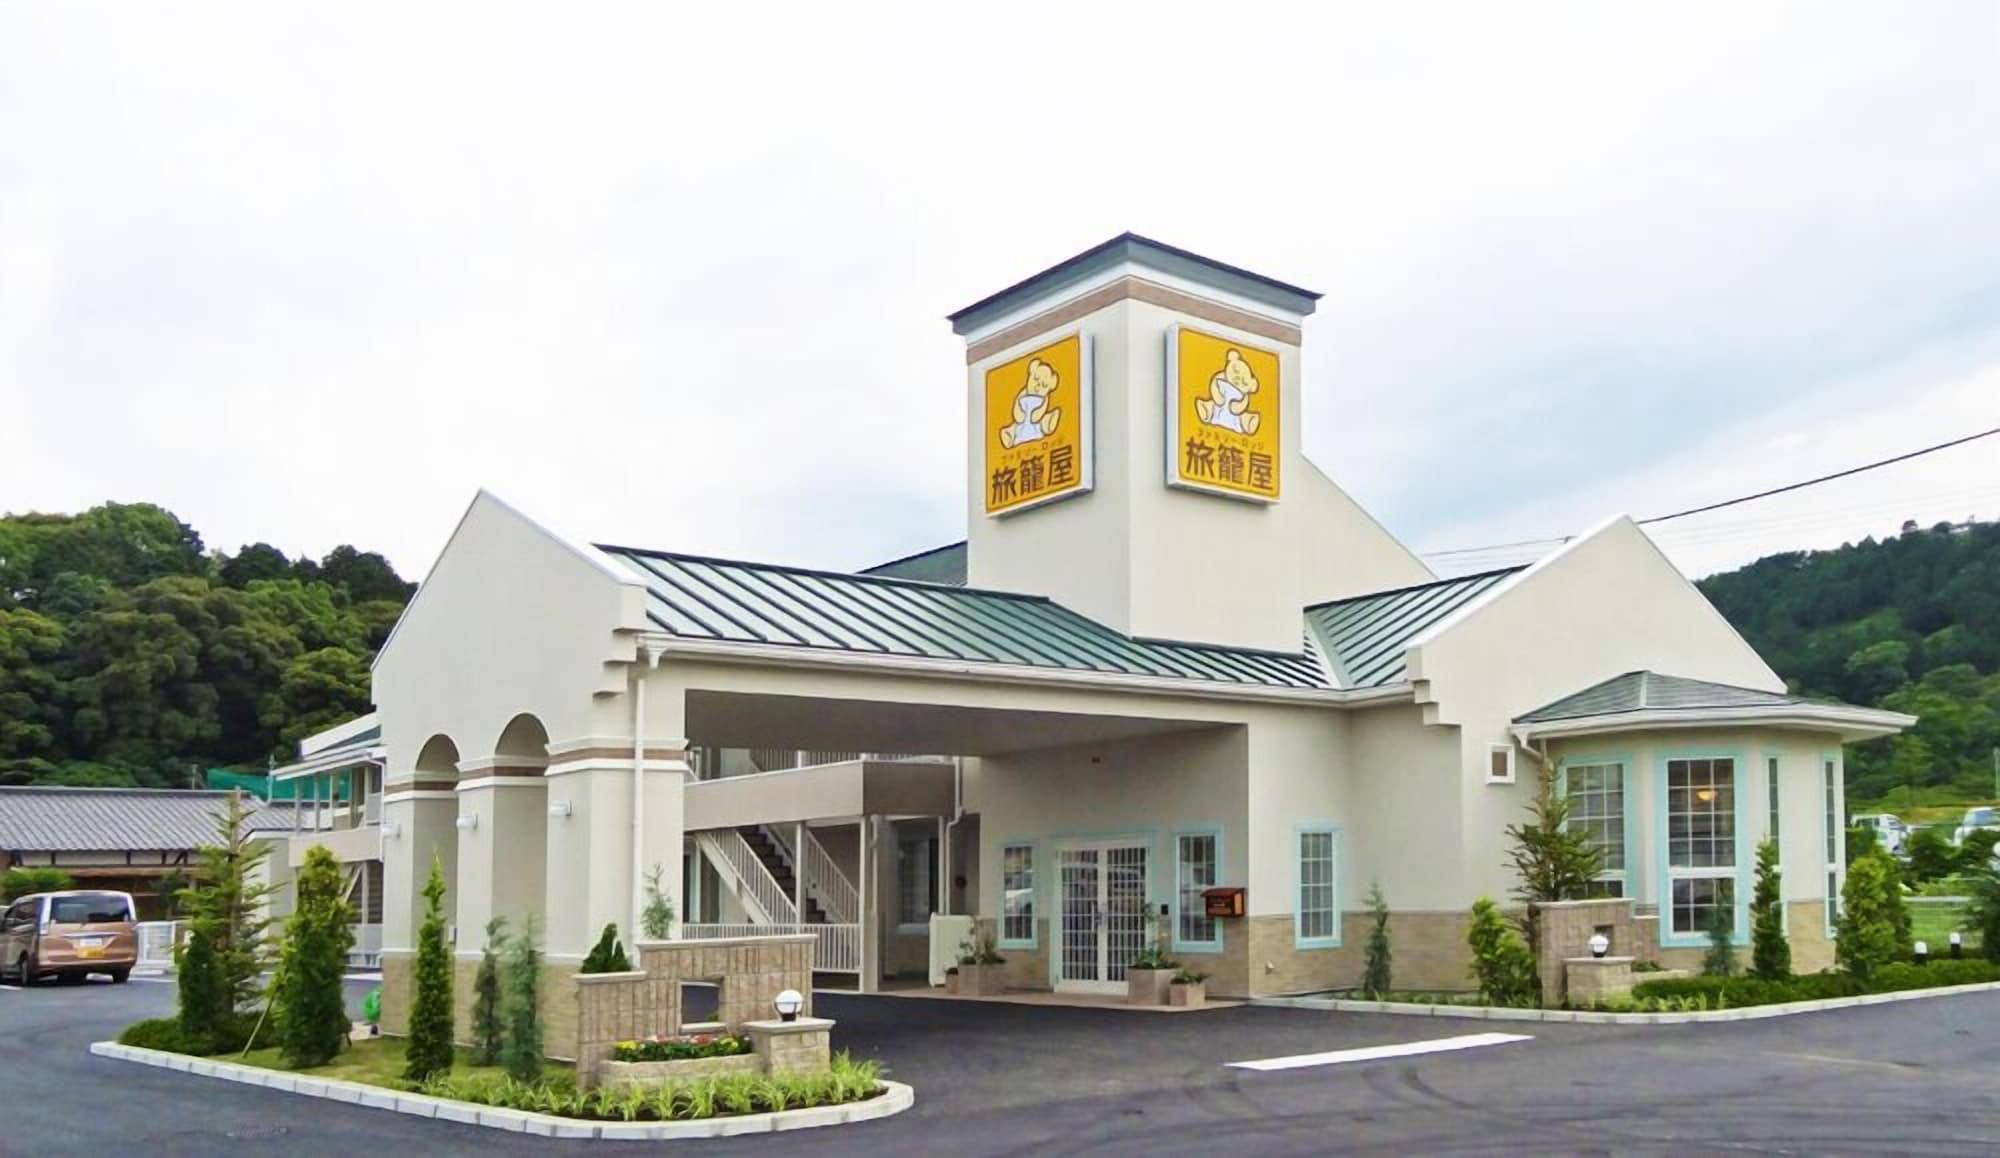 Family Lodge Hatagoya Niihama, Niihama